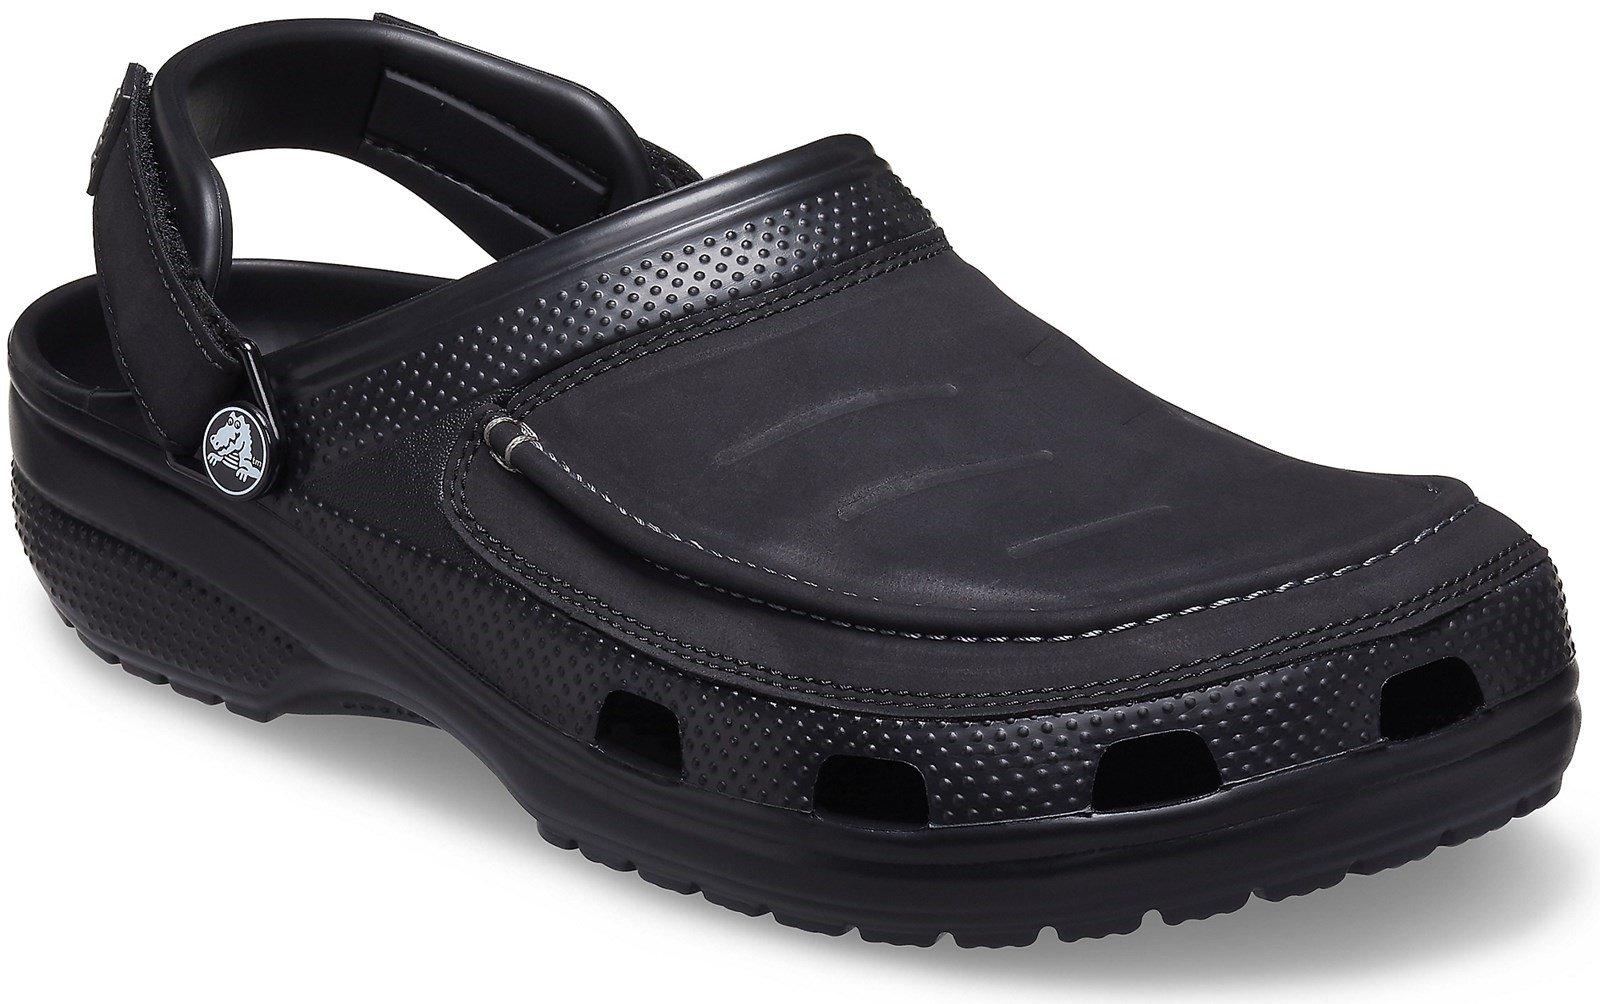 Crocs Men's Yukon Vista II Beach Flip Flop Various Colours 31867 - Black 6